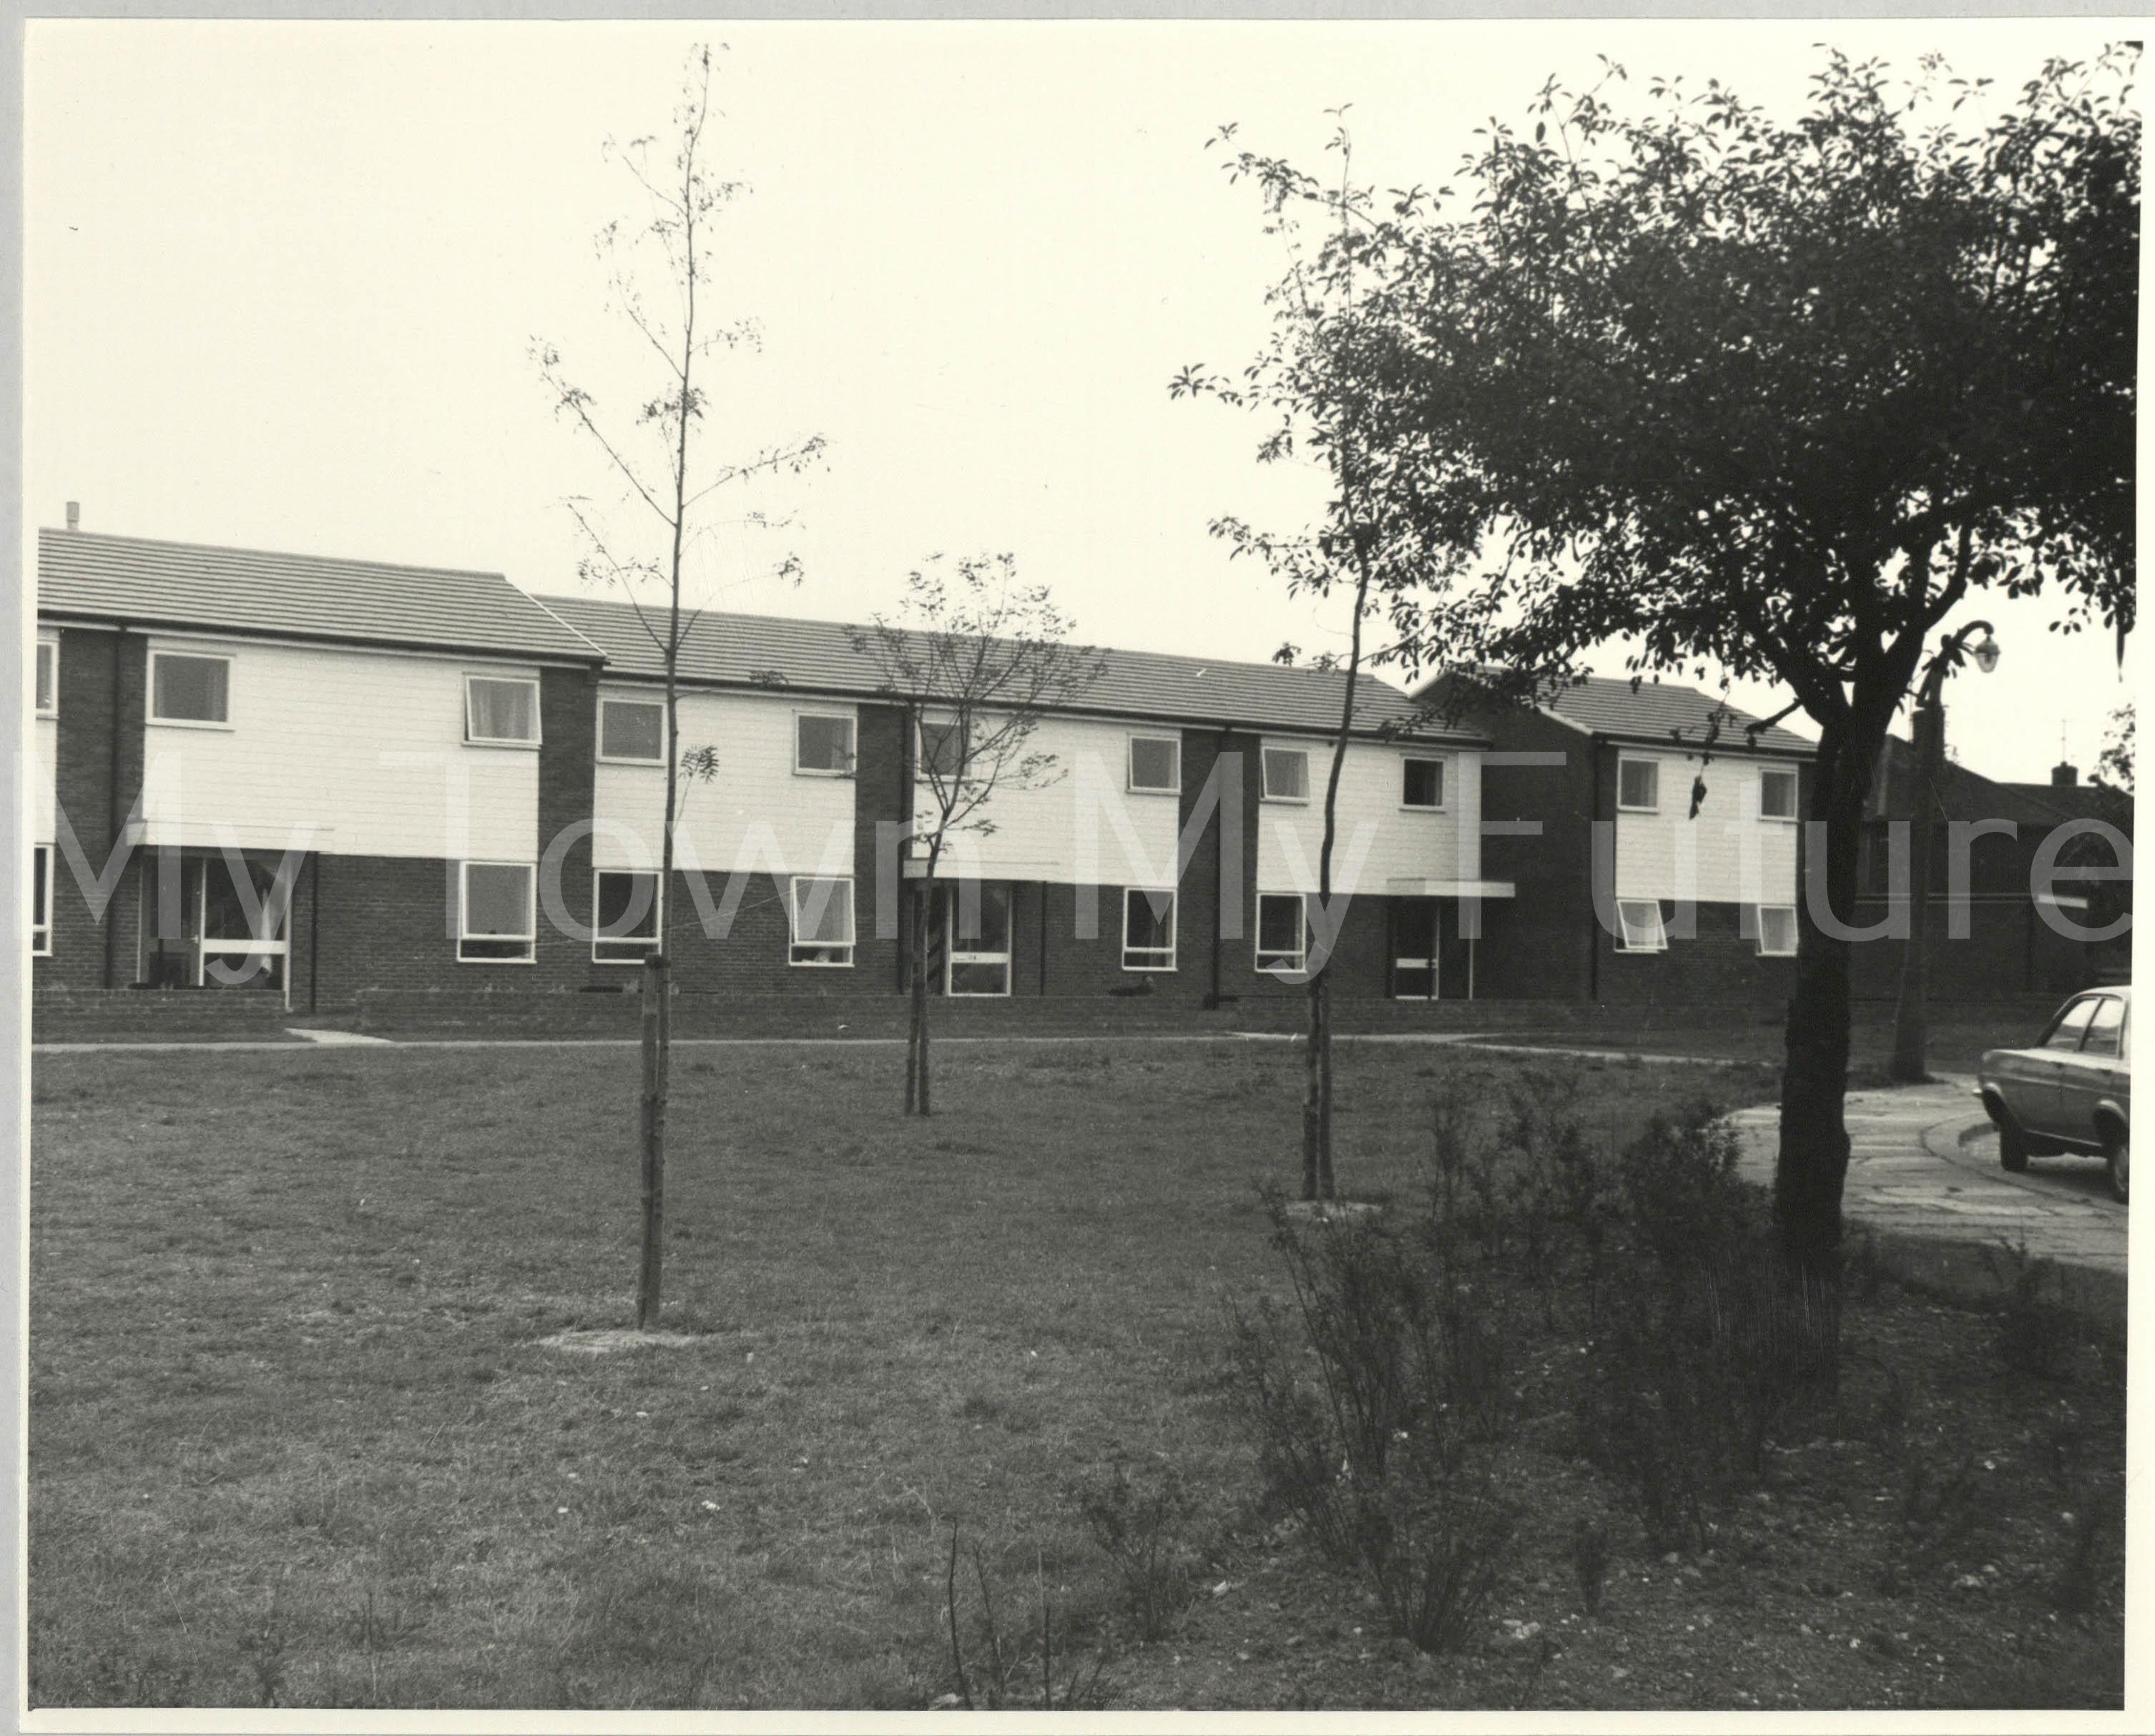 Sunningdale Road, Saltersgill, Middlesbrough